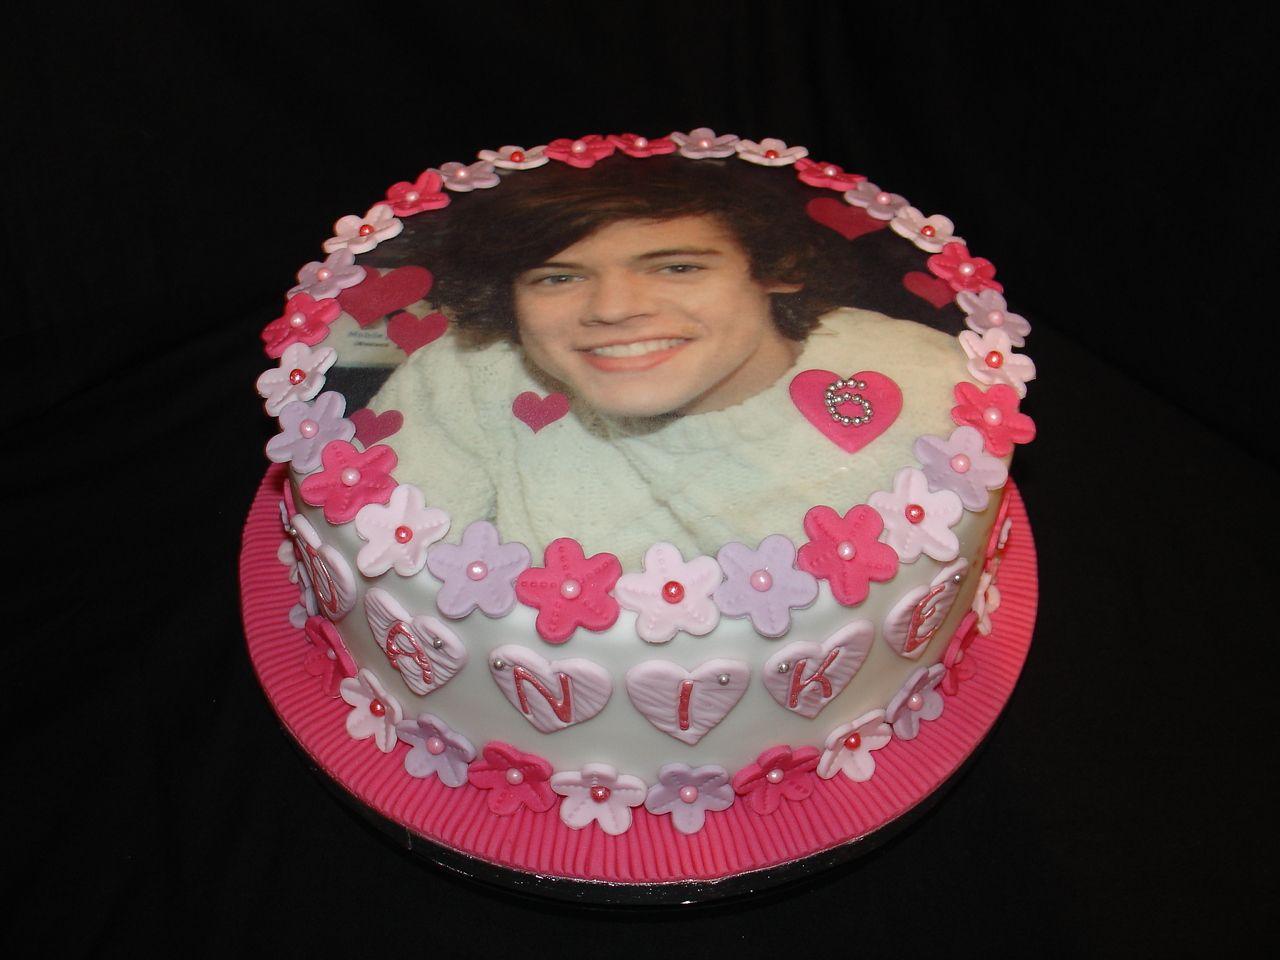 One Direction Harry Styles Fondant Cake Jan 2013 Harry Styles